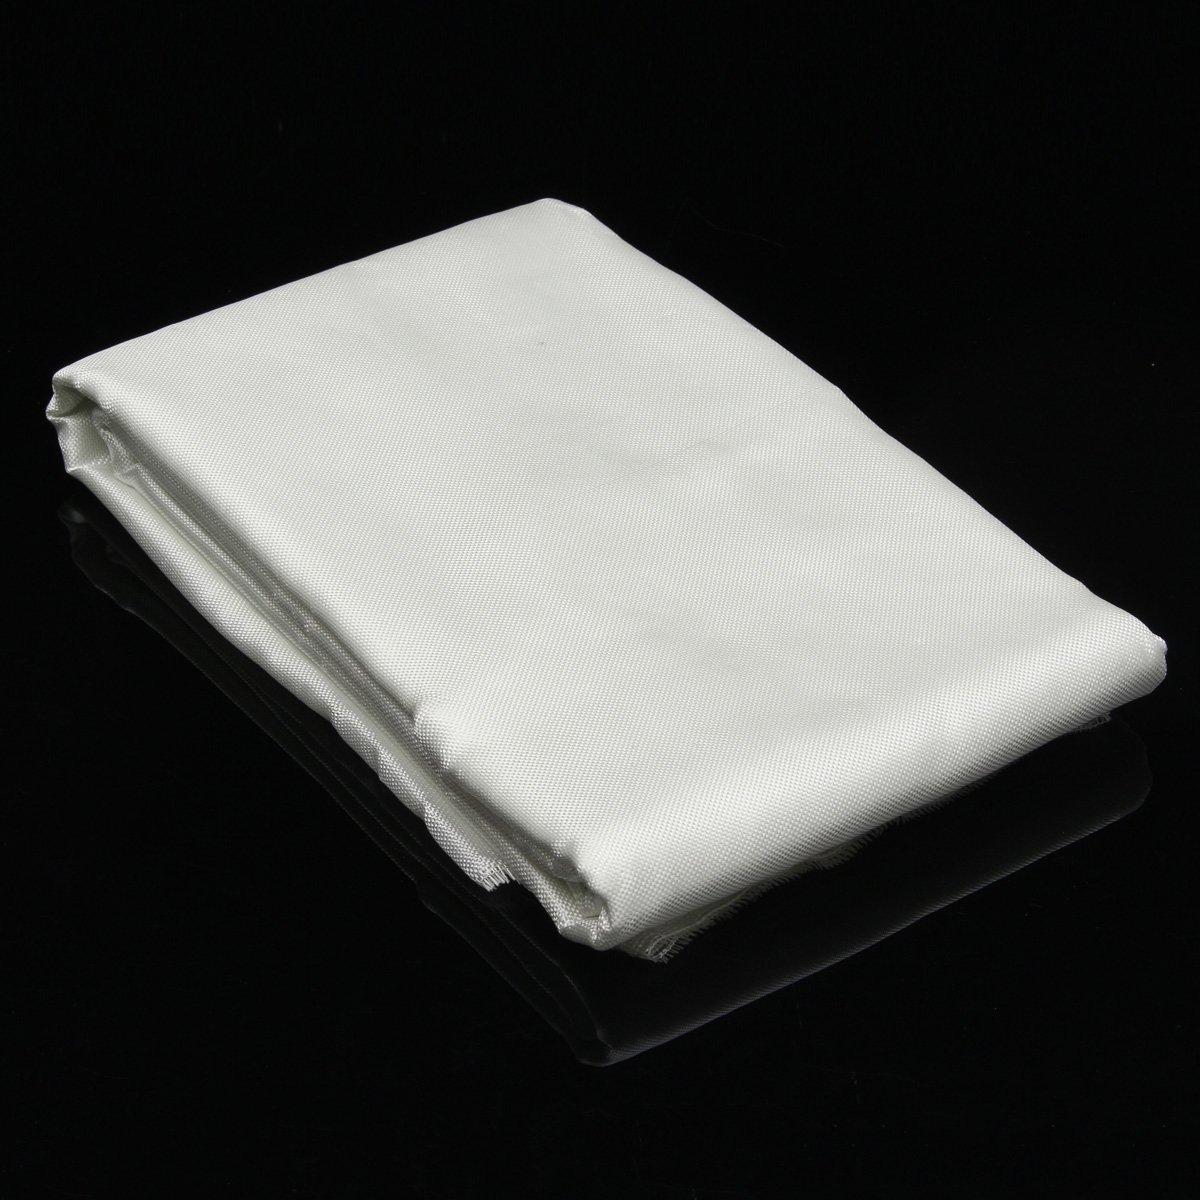 CocinaCo 1.27x5.5m Fiber Glass Woven Roving Fiber Plain Weave Cloth DIY Craft